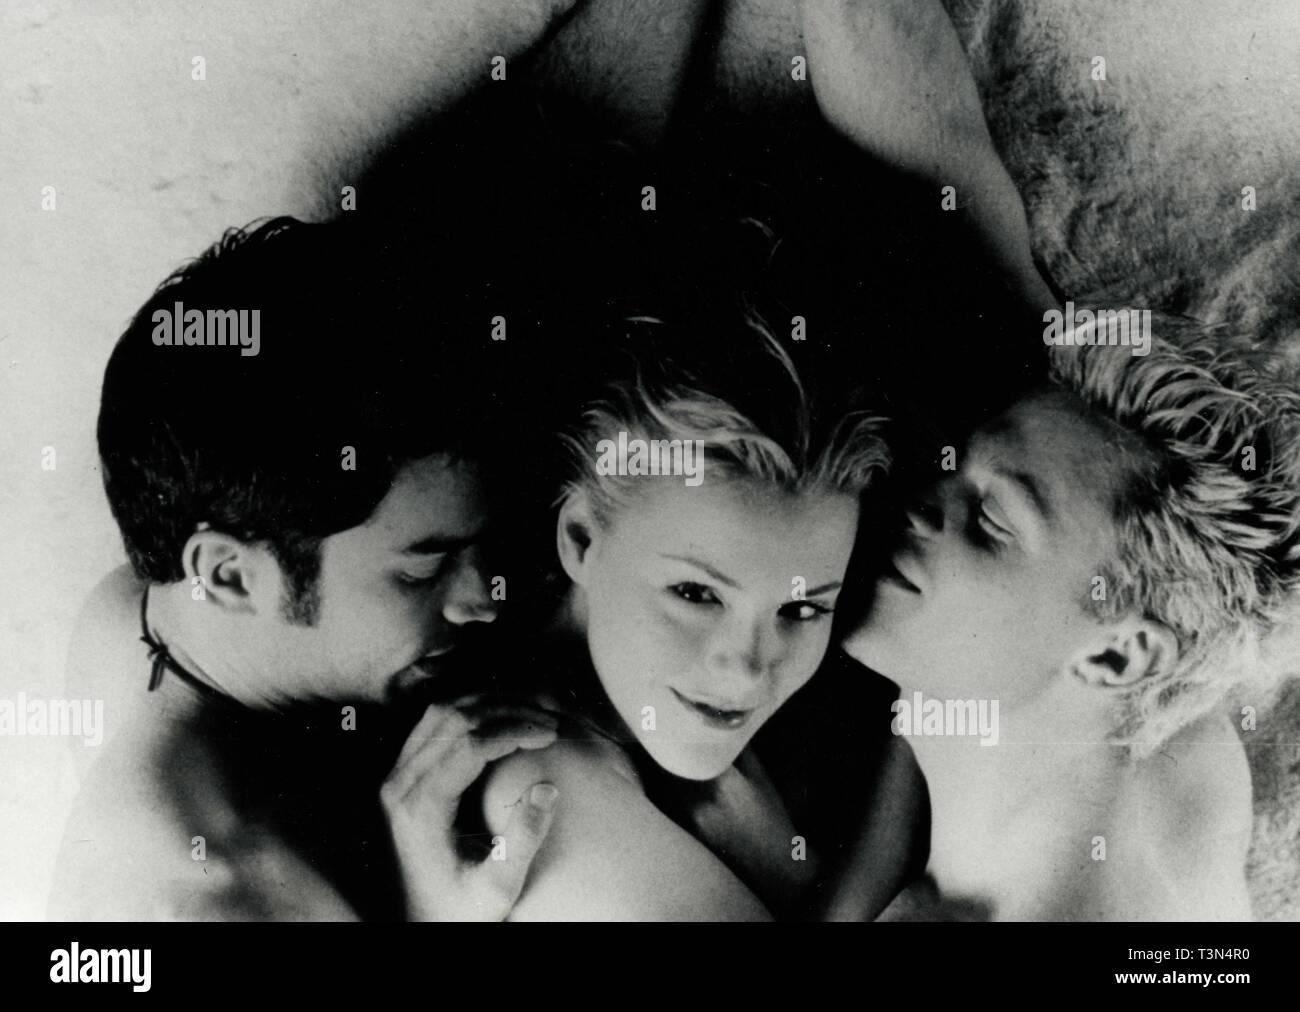 Actors Johnathon Schaech, Kathleen Robertson, and Matt Keeslar in the movie Splendor, 1990s - Stock Image